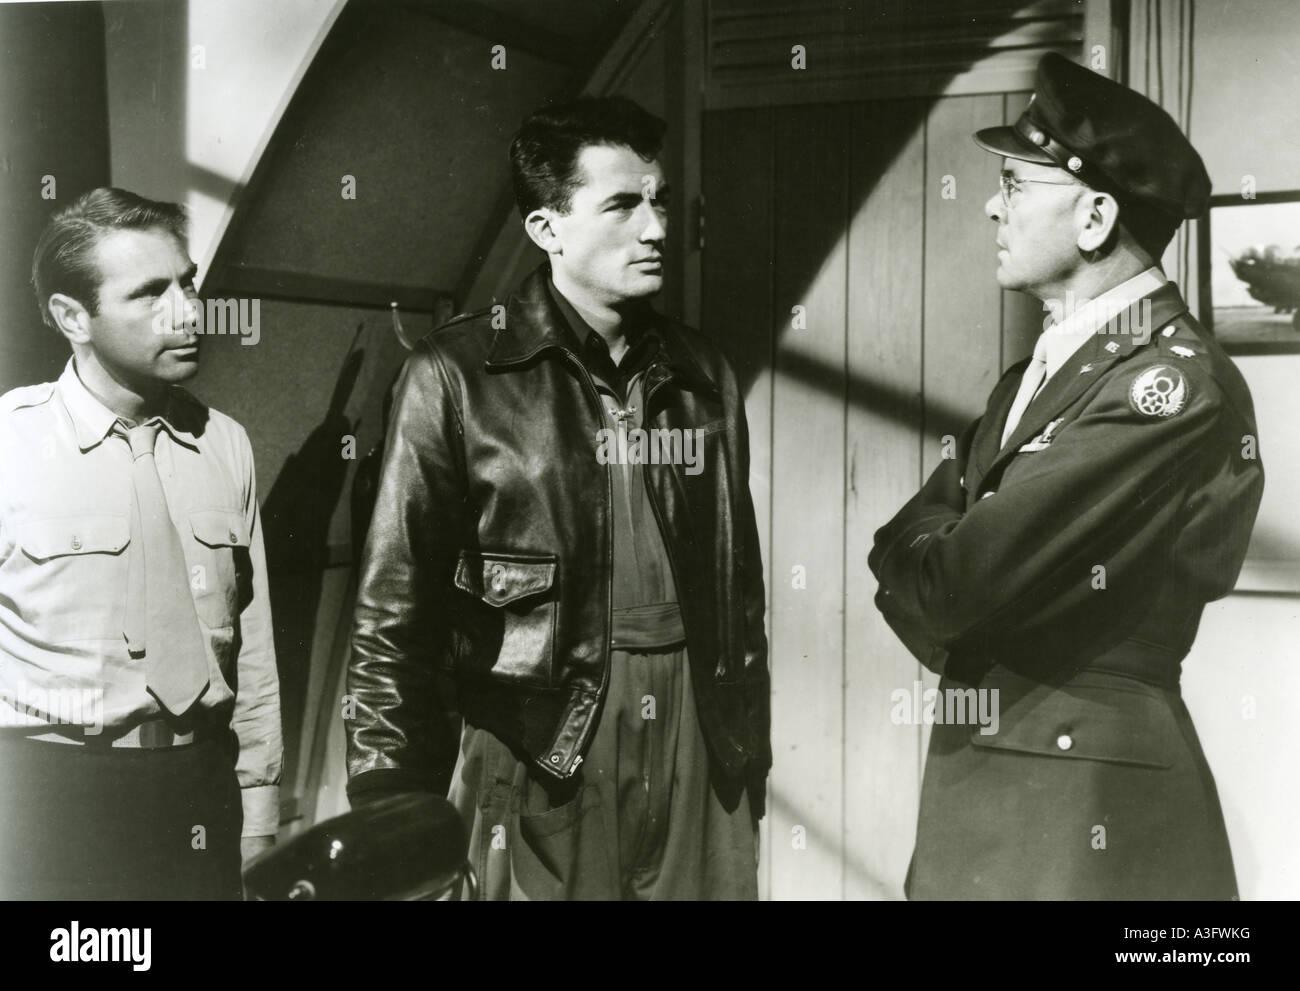 12 O'Clock HIGH 1949 TCF film avec Gregory Peck - centre Photo Stock